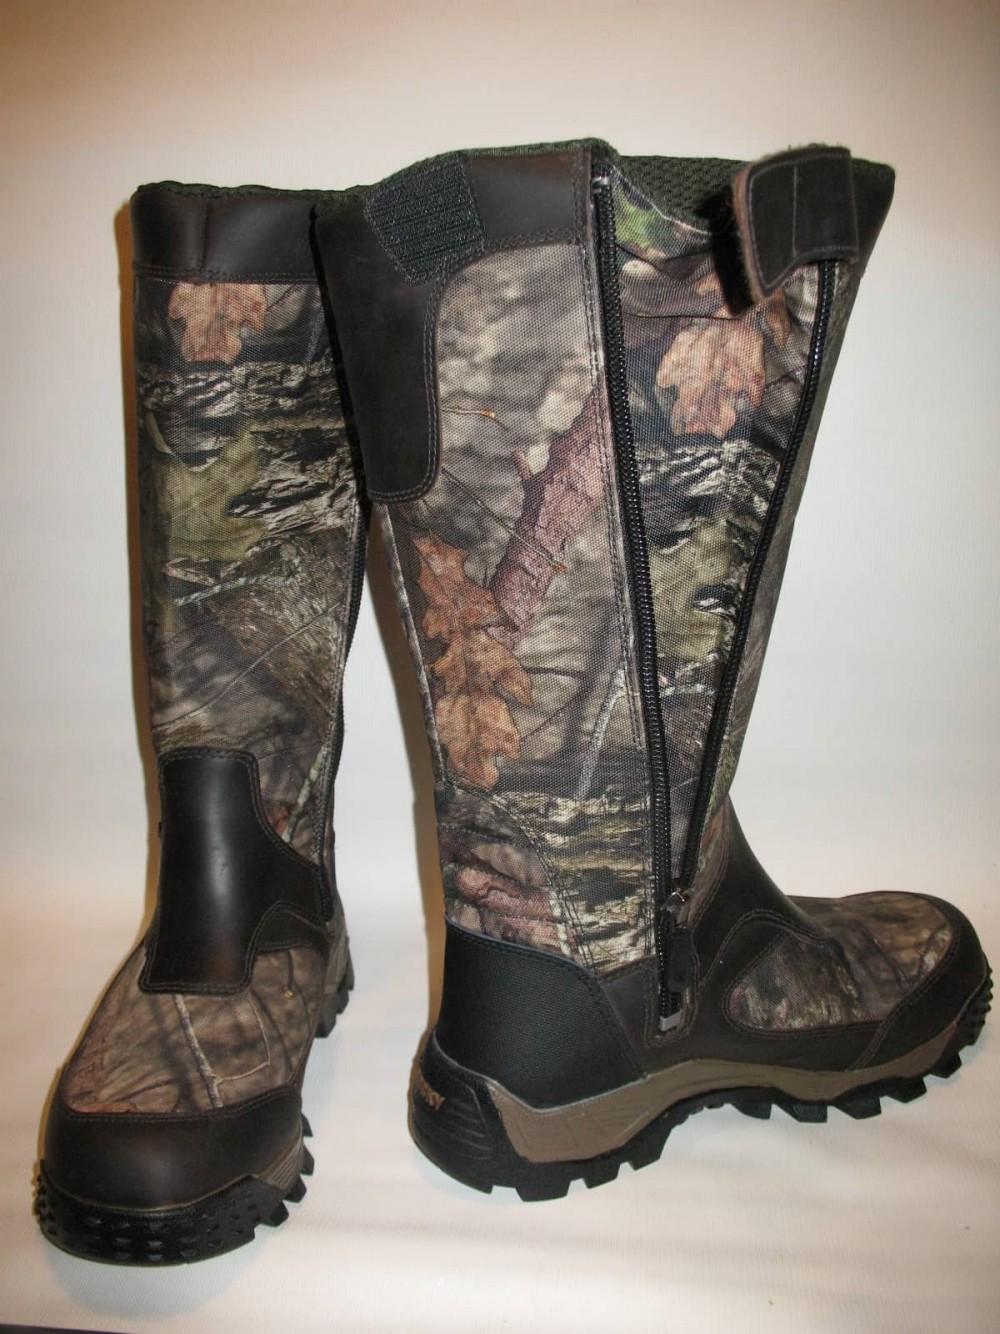 Ботинки ROCKY snake sport pro 16 boots (размер UK7,5/US8,5/EU42(на стопу до 270 mm)) - 8